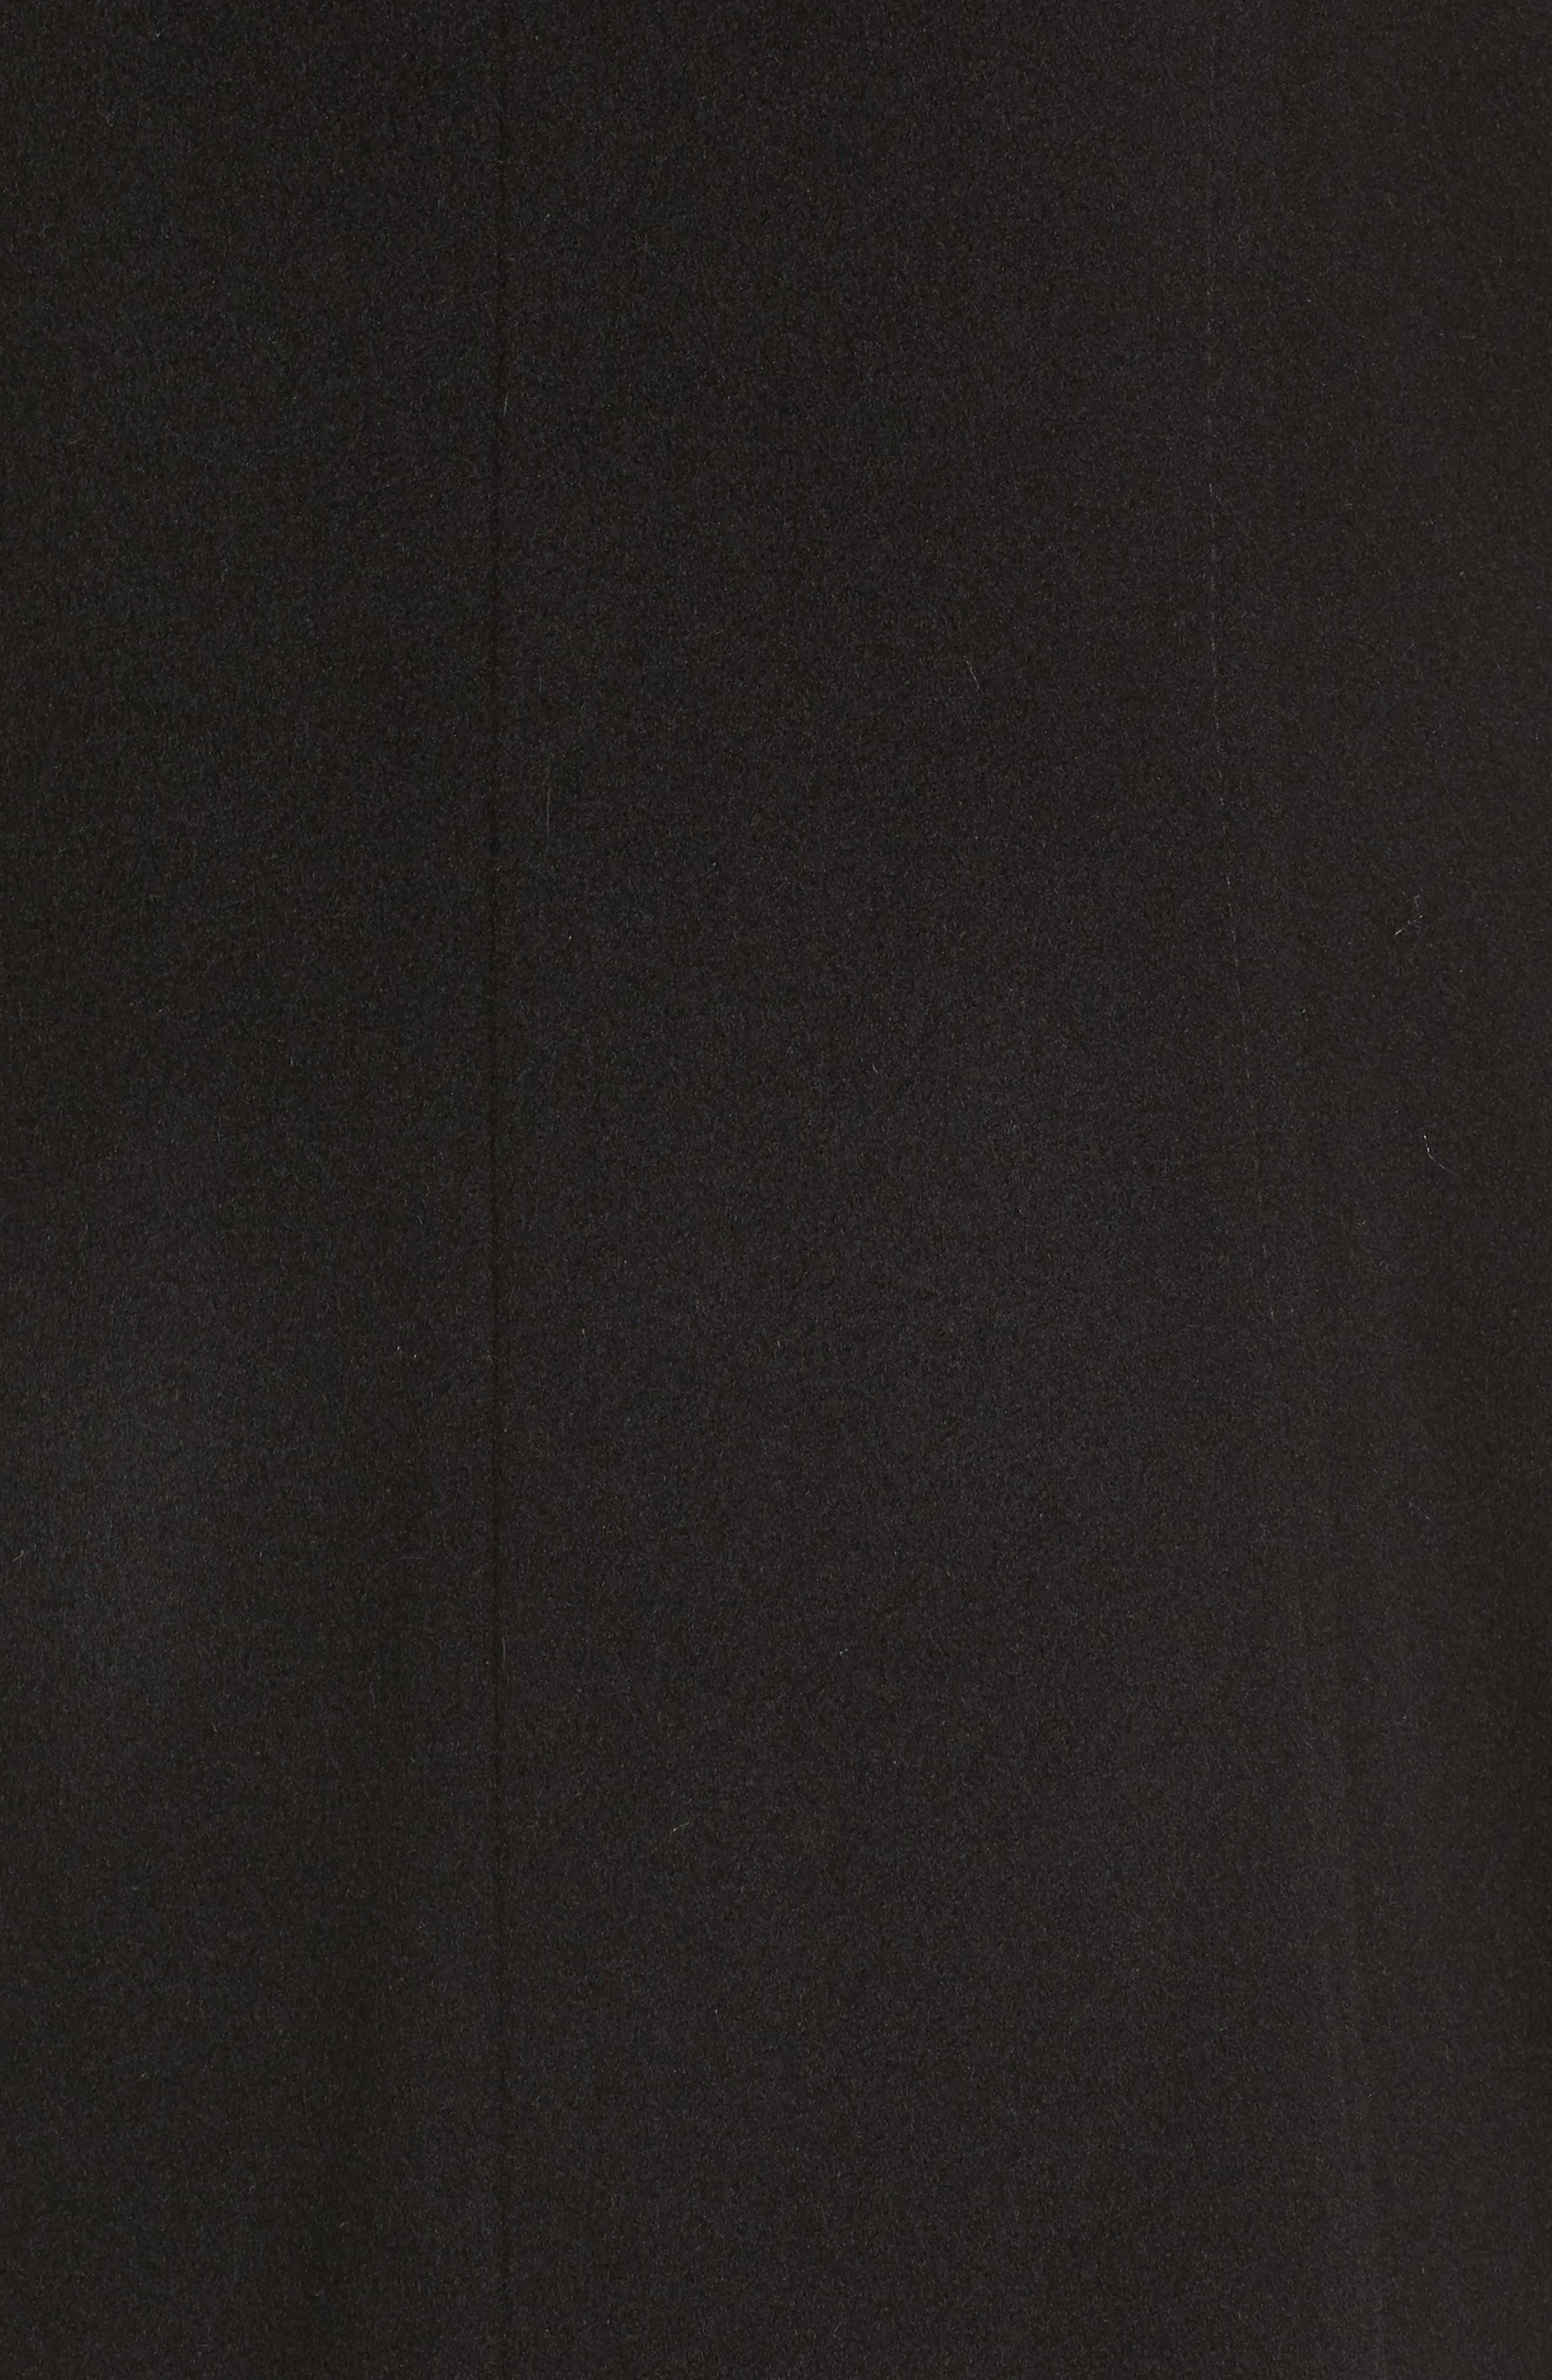 Hooded Wool Blend Coat with Genuine Fox Fur Trim,                             Alternate thumbnail 5, color,                             Black